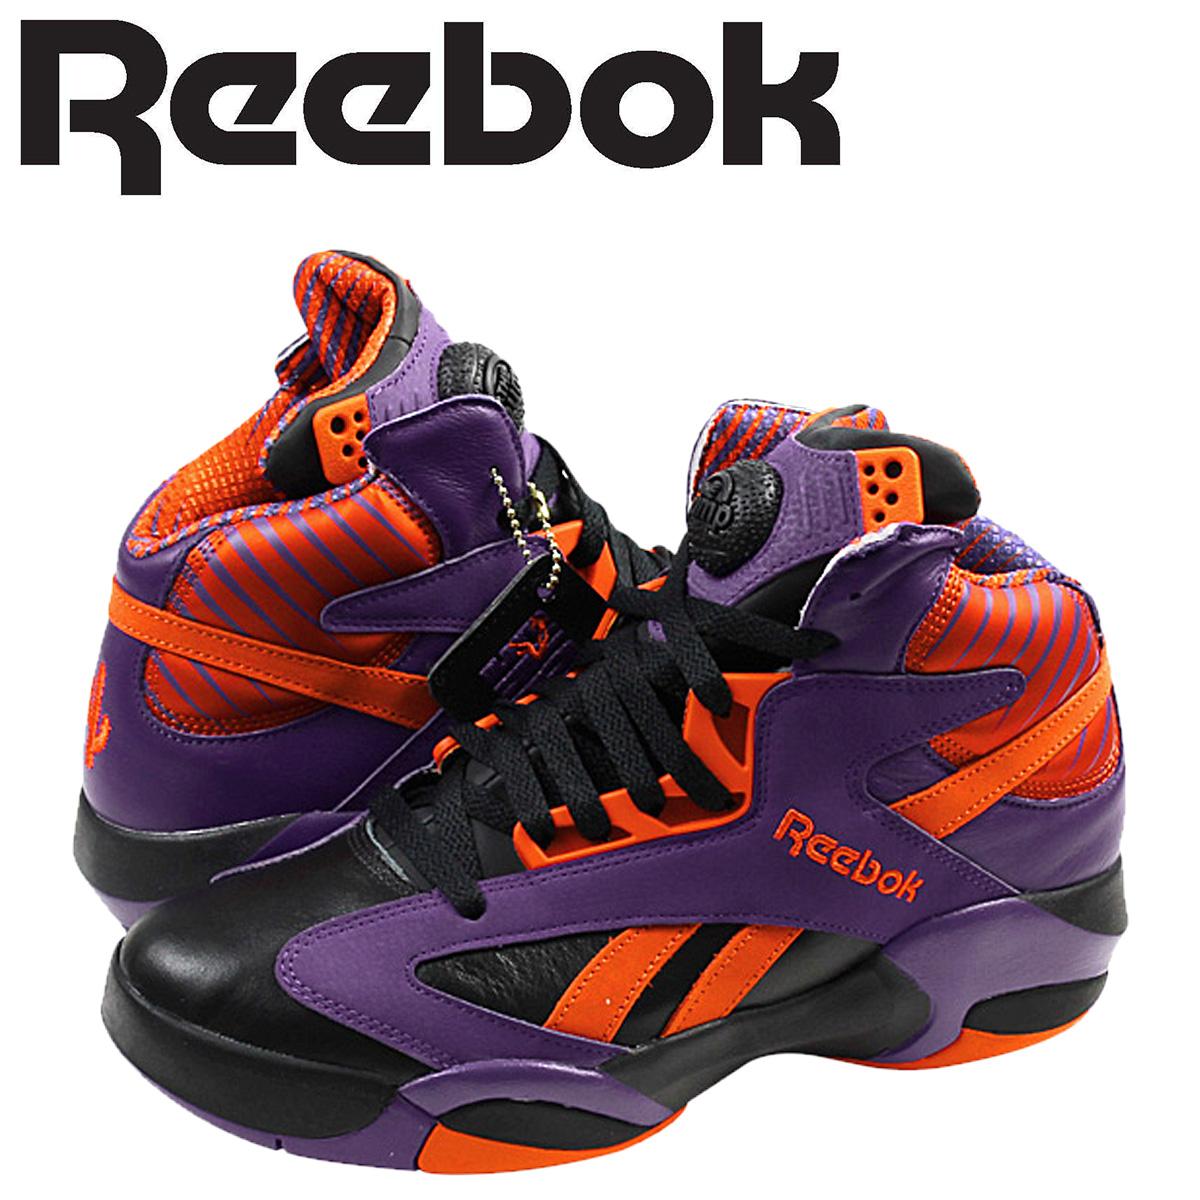 Reebok リーボック シャック スニーカー SHAQ ATTAQ PHOENIX SUNS V61029 メンズ 靴 パープル